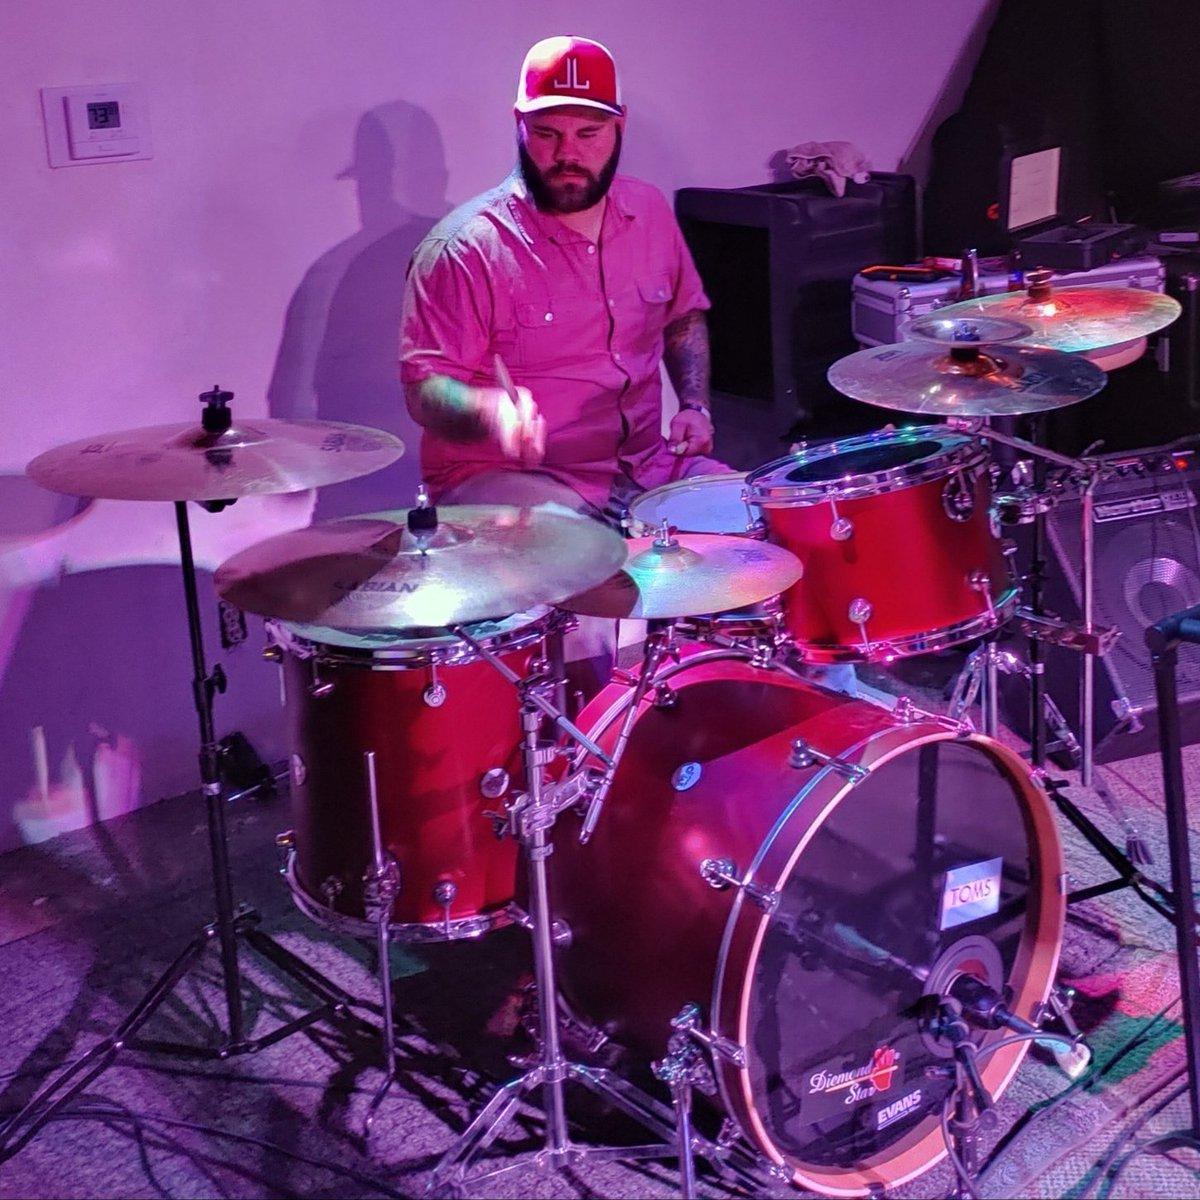 Keep practicing. Keep your skills sharp.  Grab your pair at https://t.co/AY2eGEECbQ  Jackson Jarrett with Diemond Star Drumsticks  #Drummer #DiemondStar #Drumsticks #FeelTheDifference #PlayTheFeeling #Drummers #Drums https://t.co/humk84BnK6